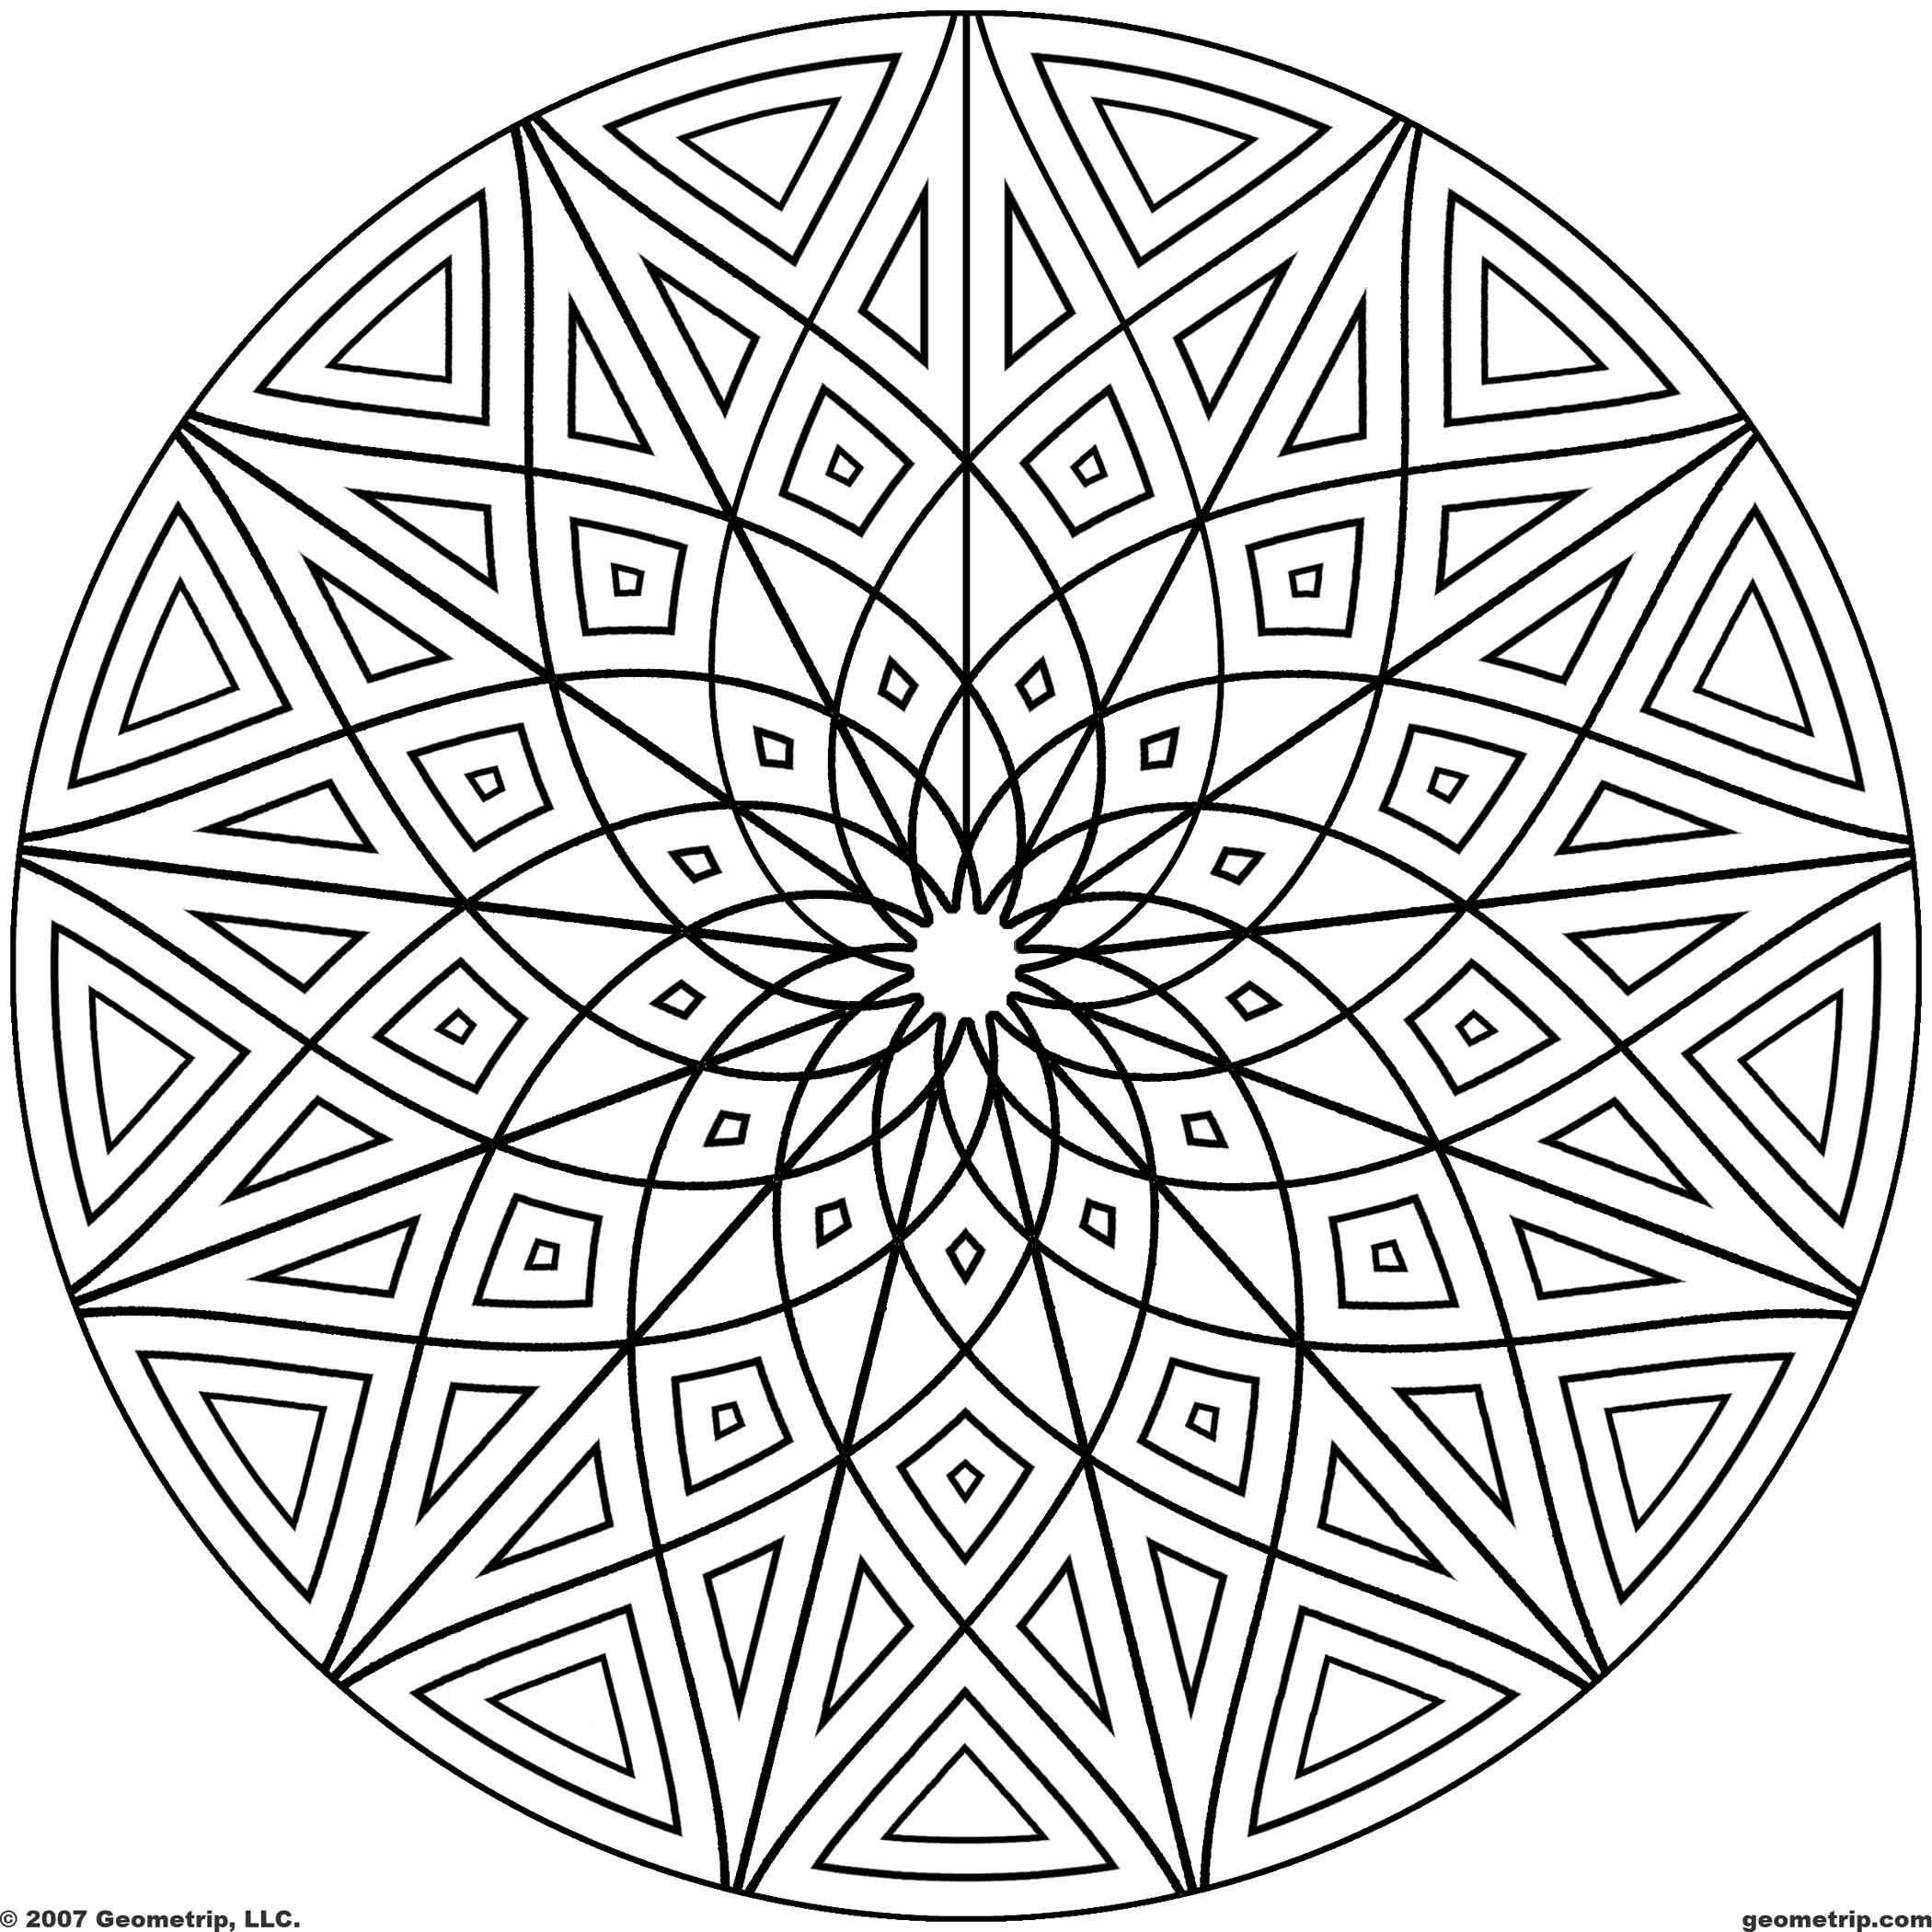 coloring circle patterns cool geometric designs coloring page for free circles patterns circle coloring